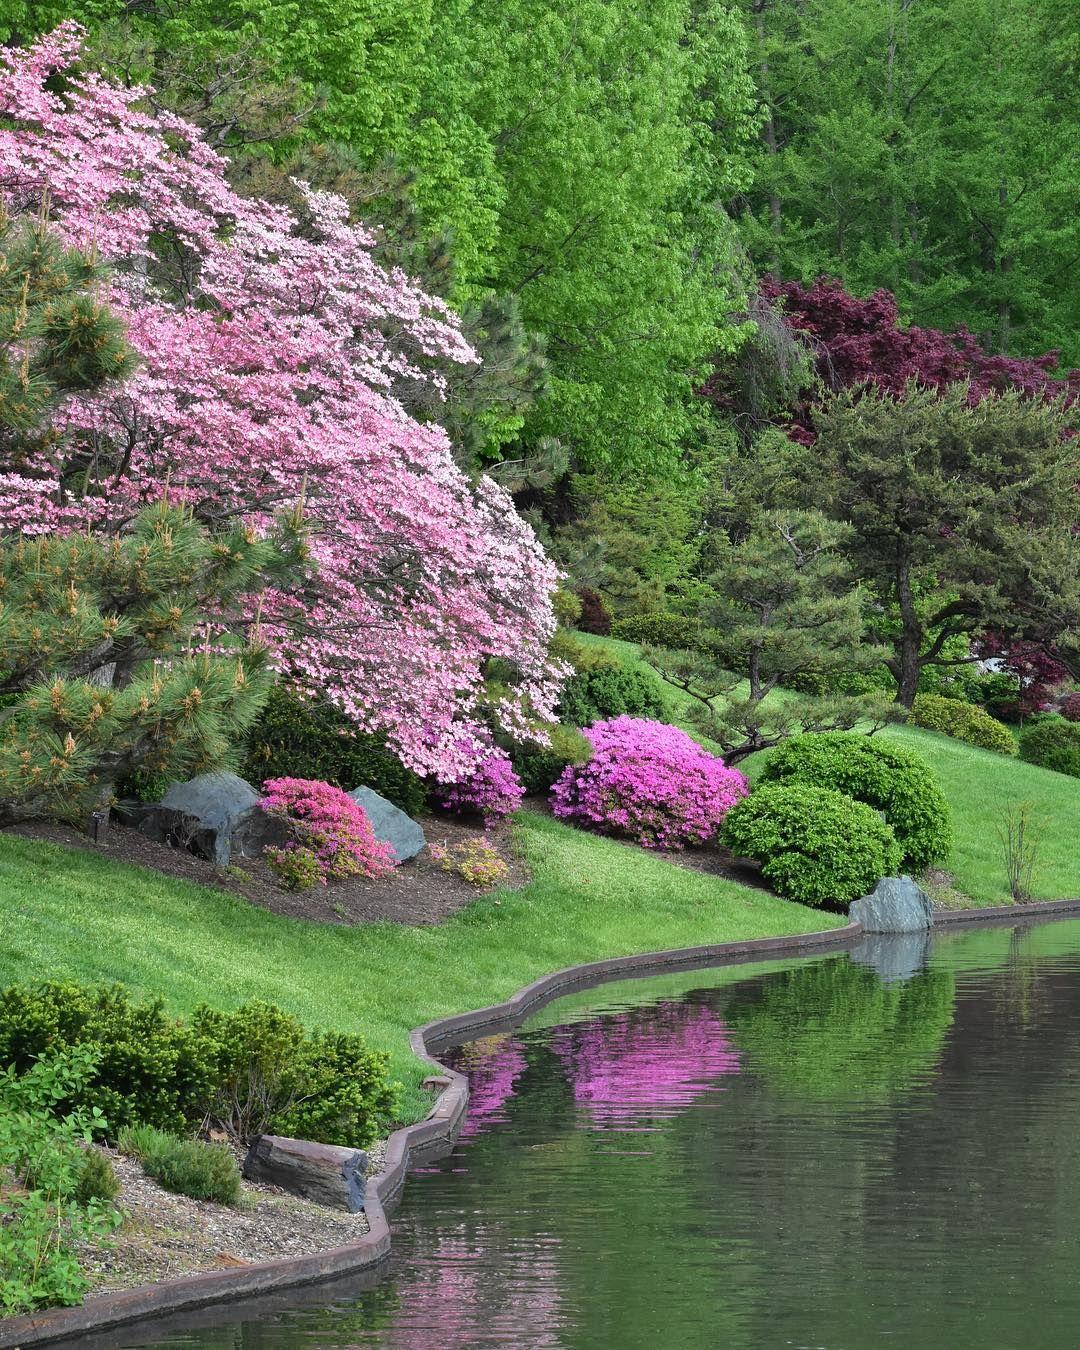 6f983b7bcd1fb1b9cdce065e947d8cfe - Best Time To Visit Missouri Botanical Gardens